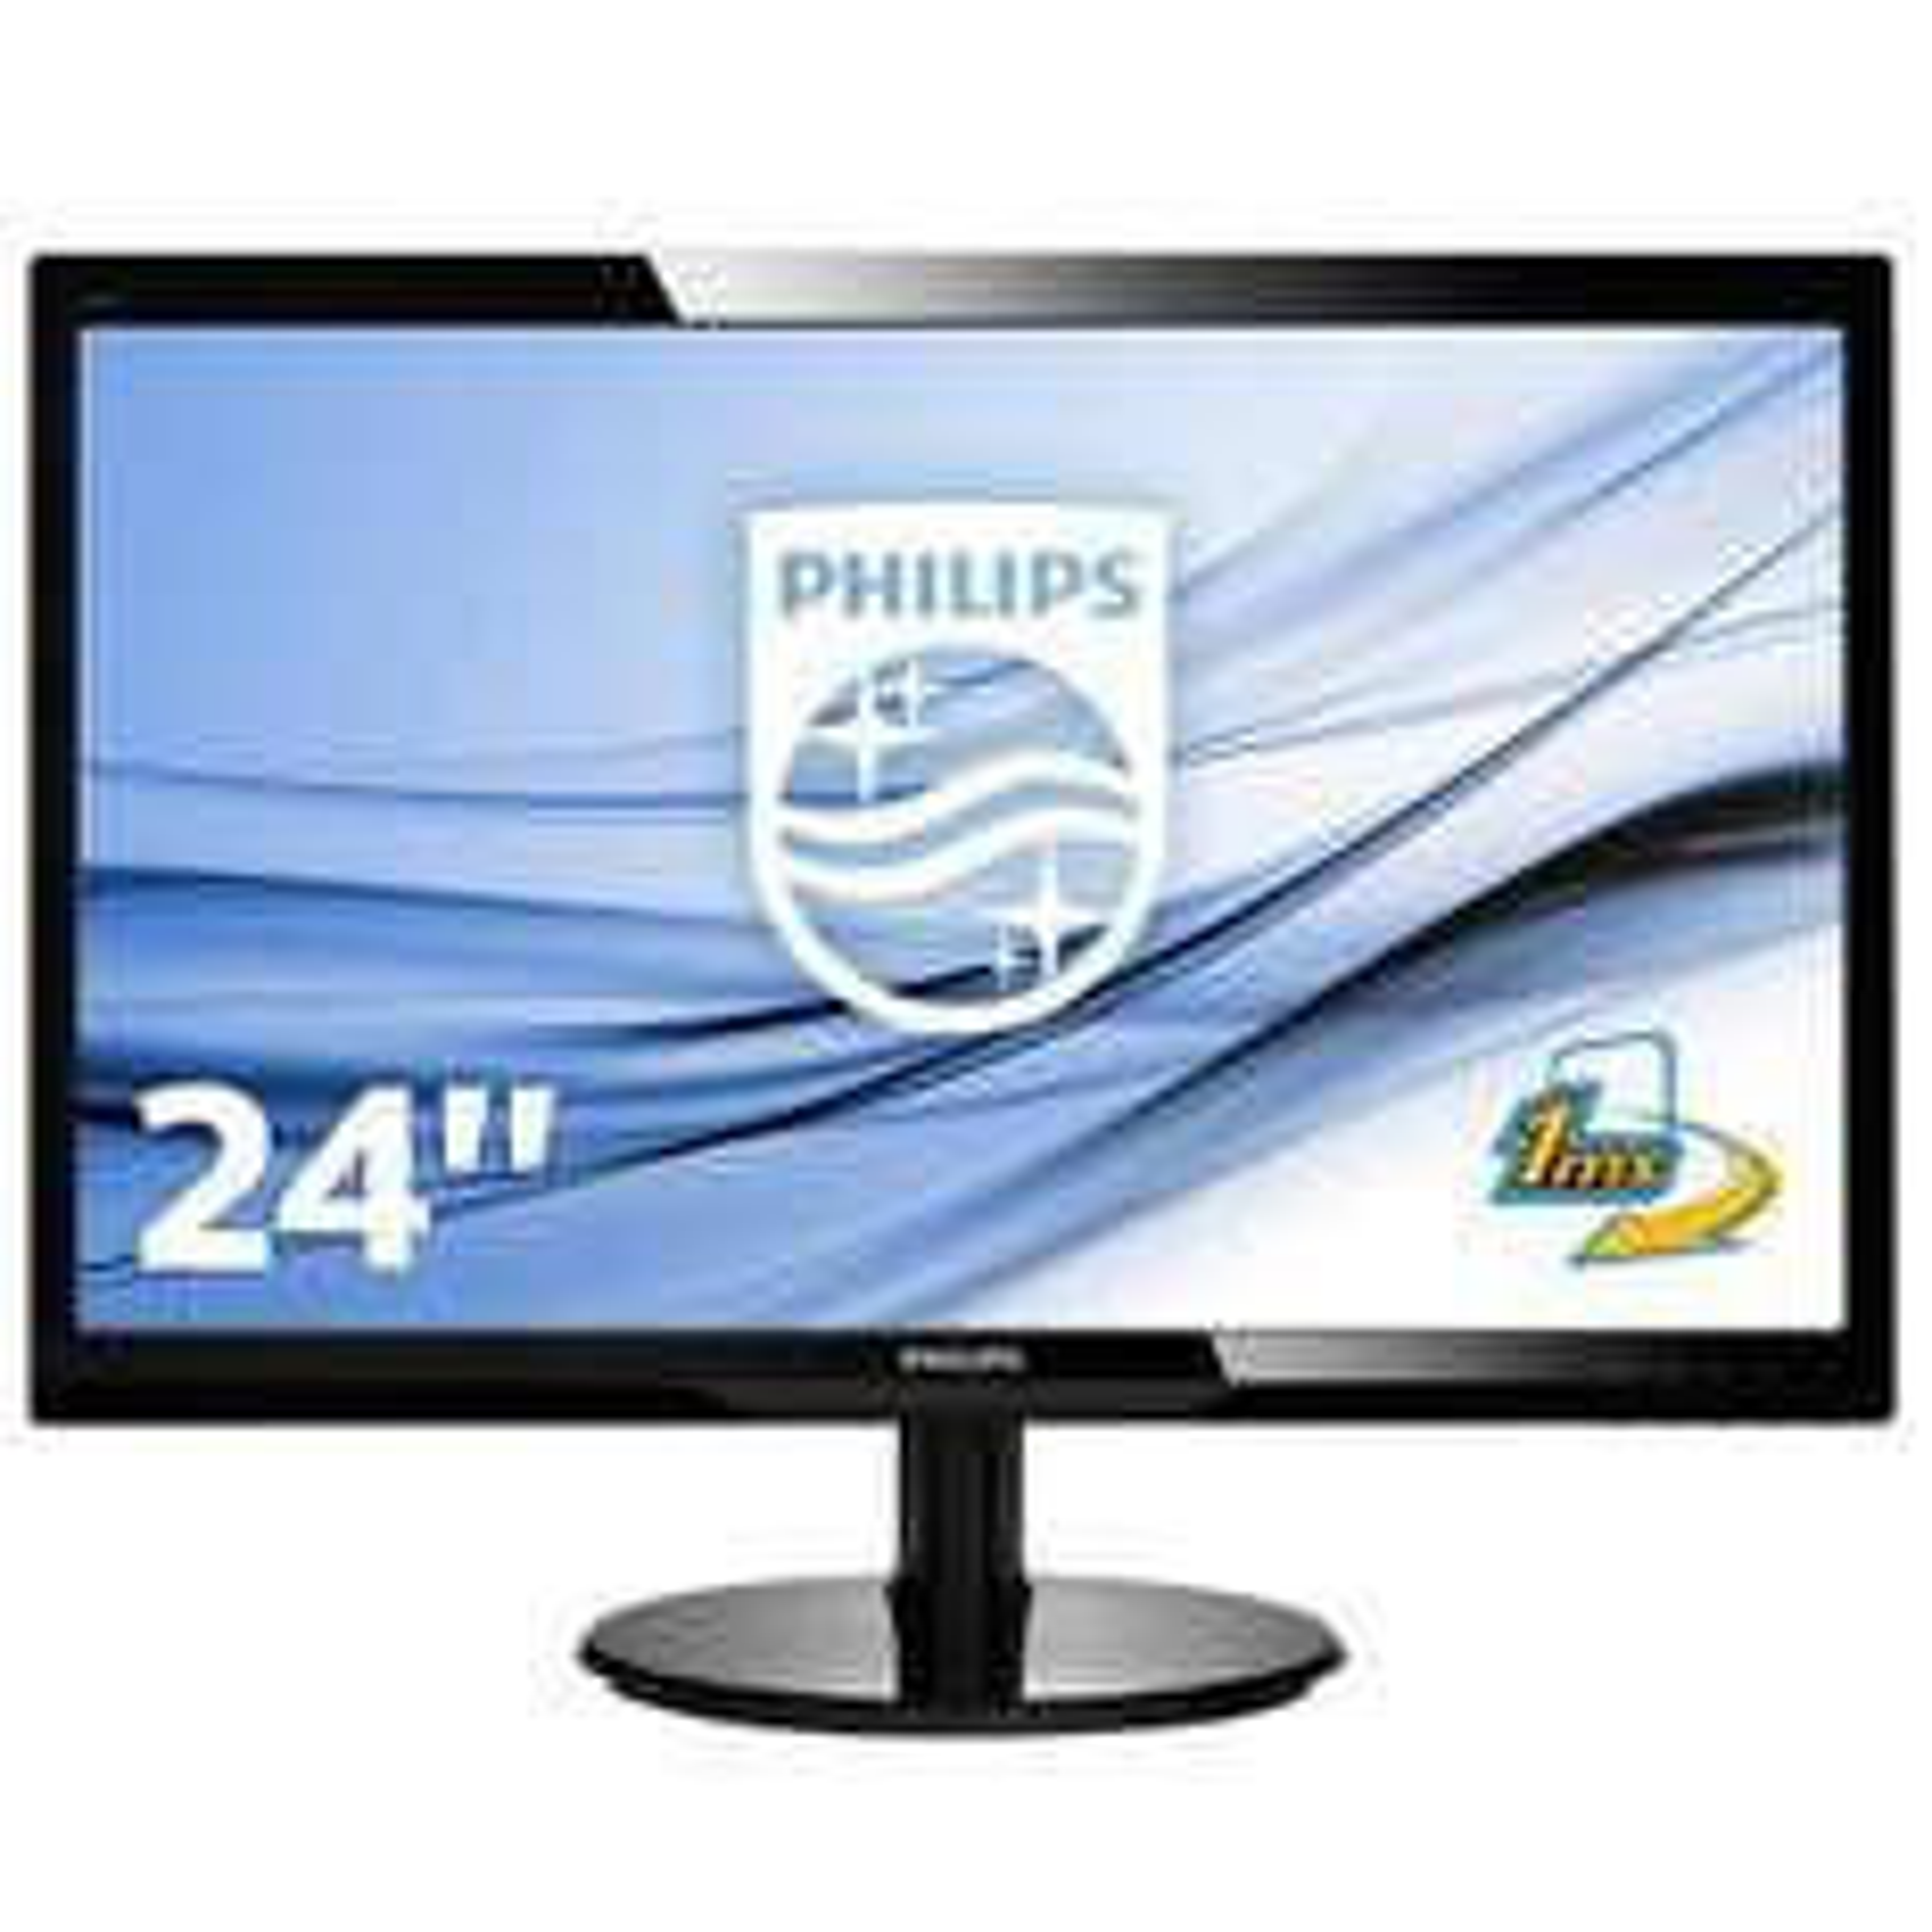 Philips 246V5LHAB - 61 cm (24 Zoll), LED, 1 ms, Lautsprecher, HDMI